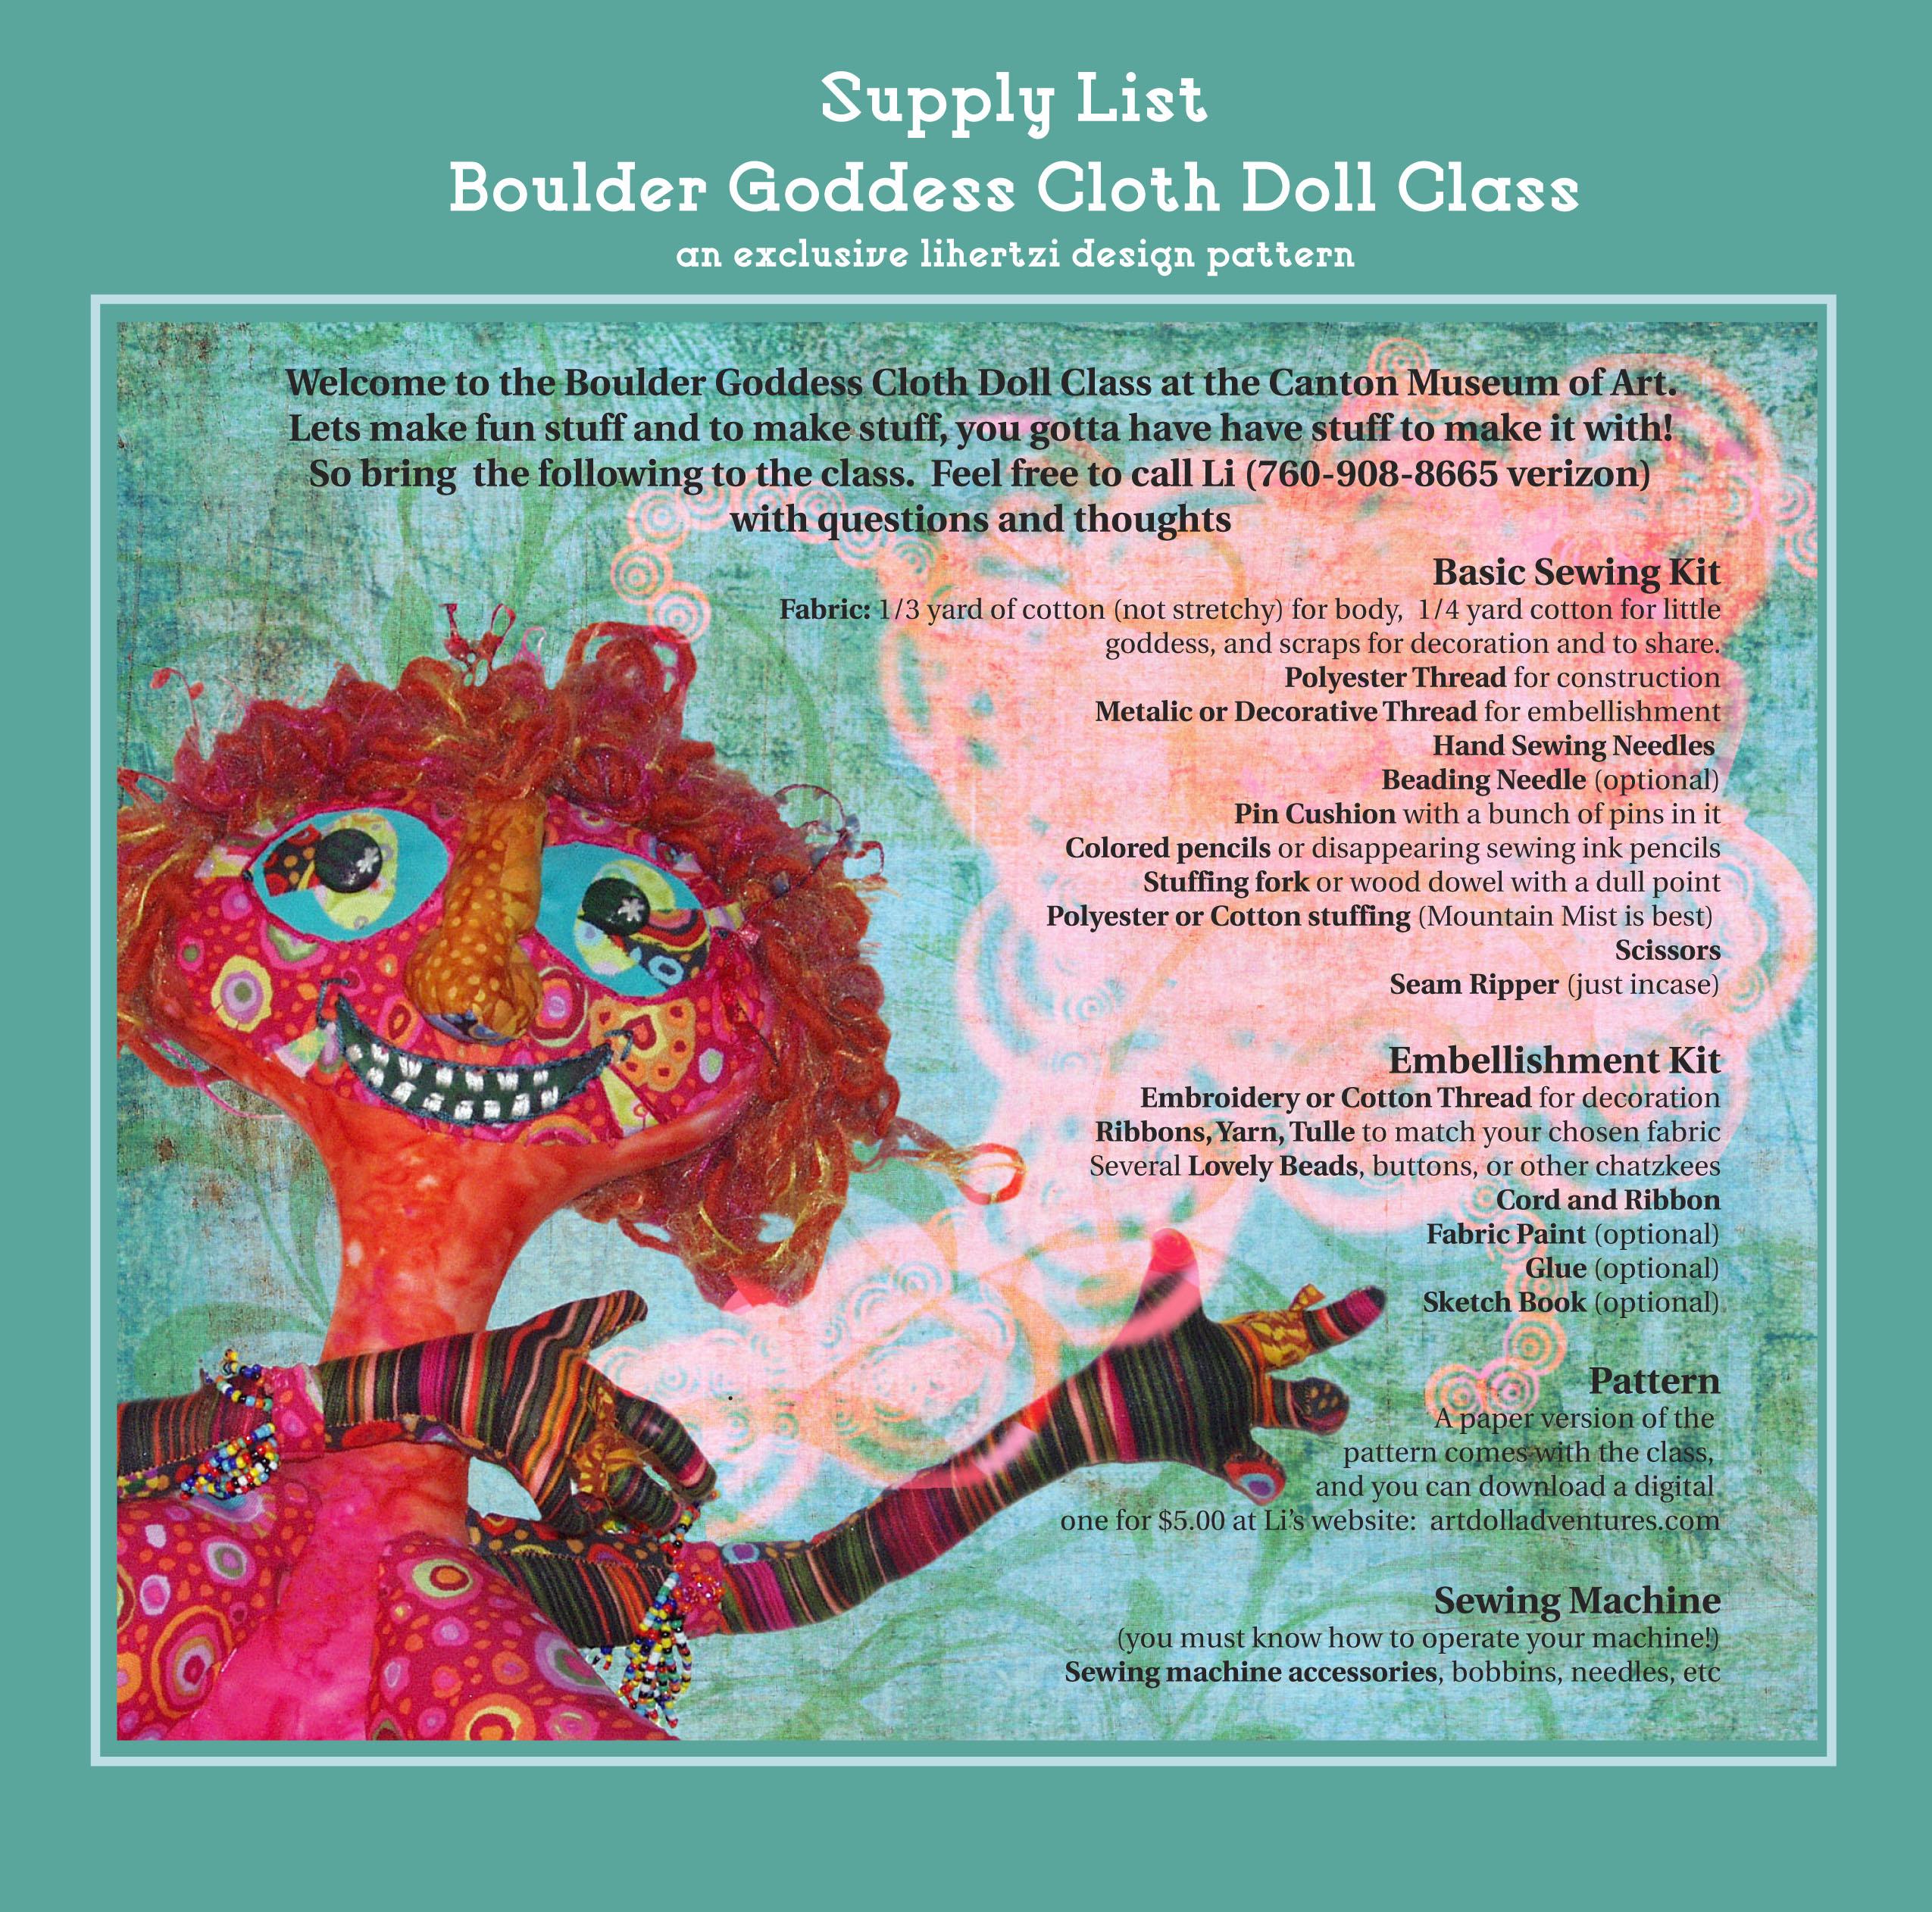 Materials List for Boulder Goddess Class at the CMA